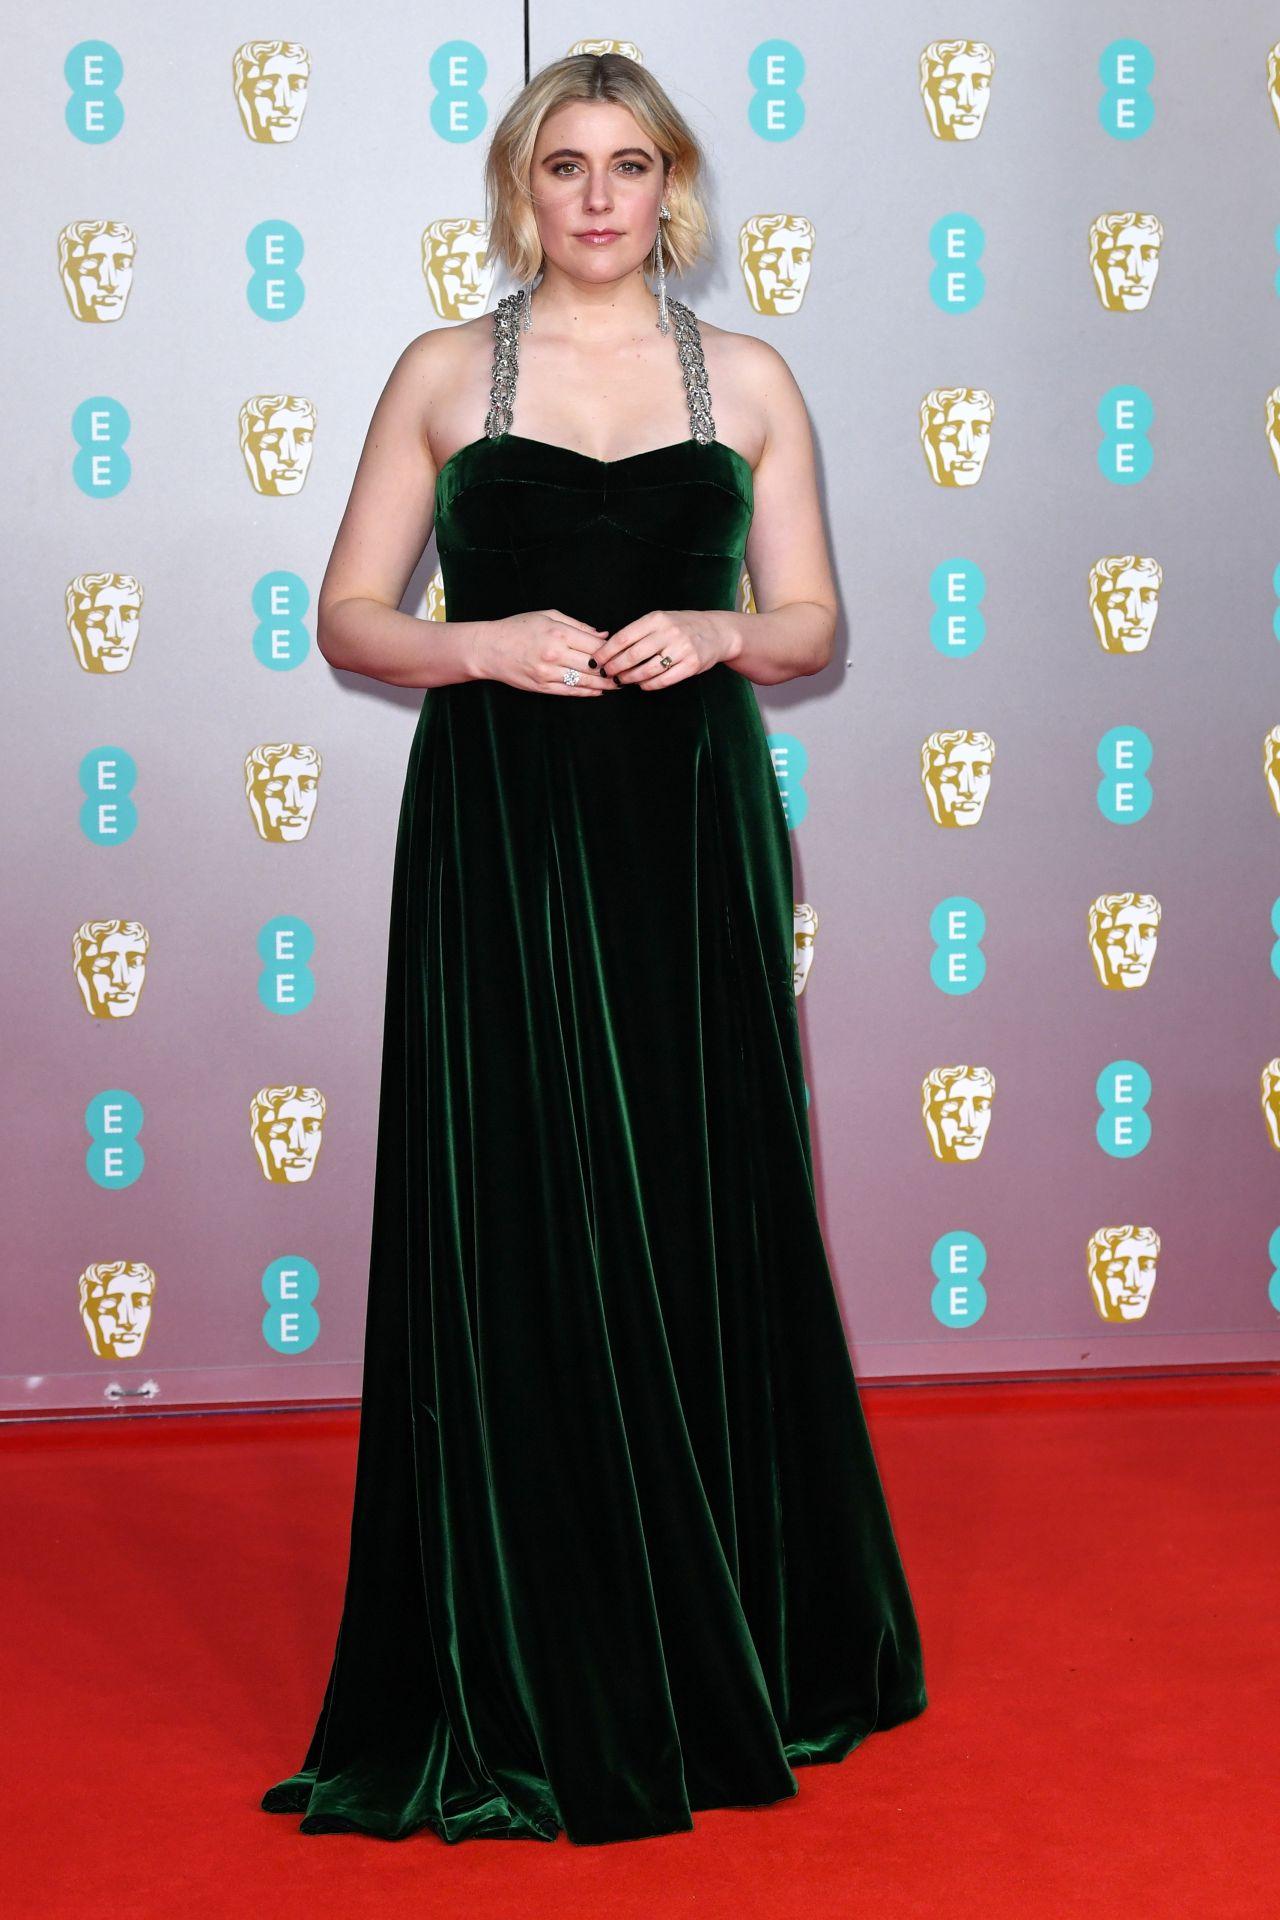 greta-gerwig-in-gucci-2020-ee-british-academy-film-awards